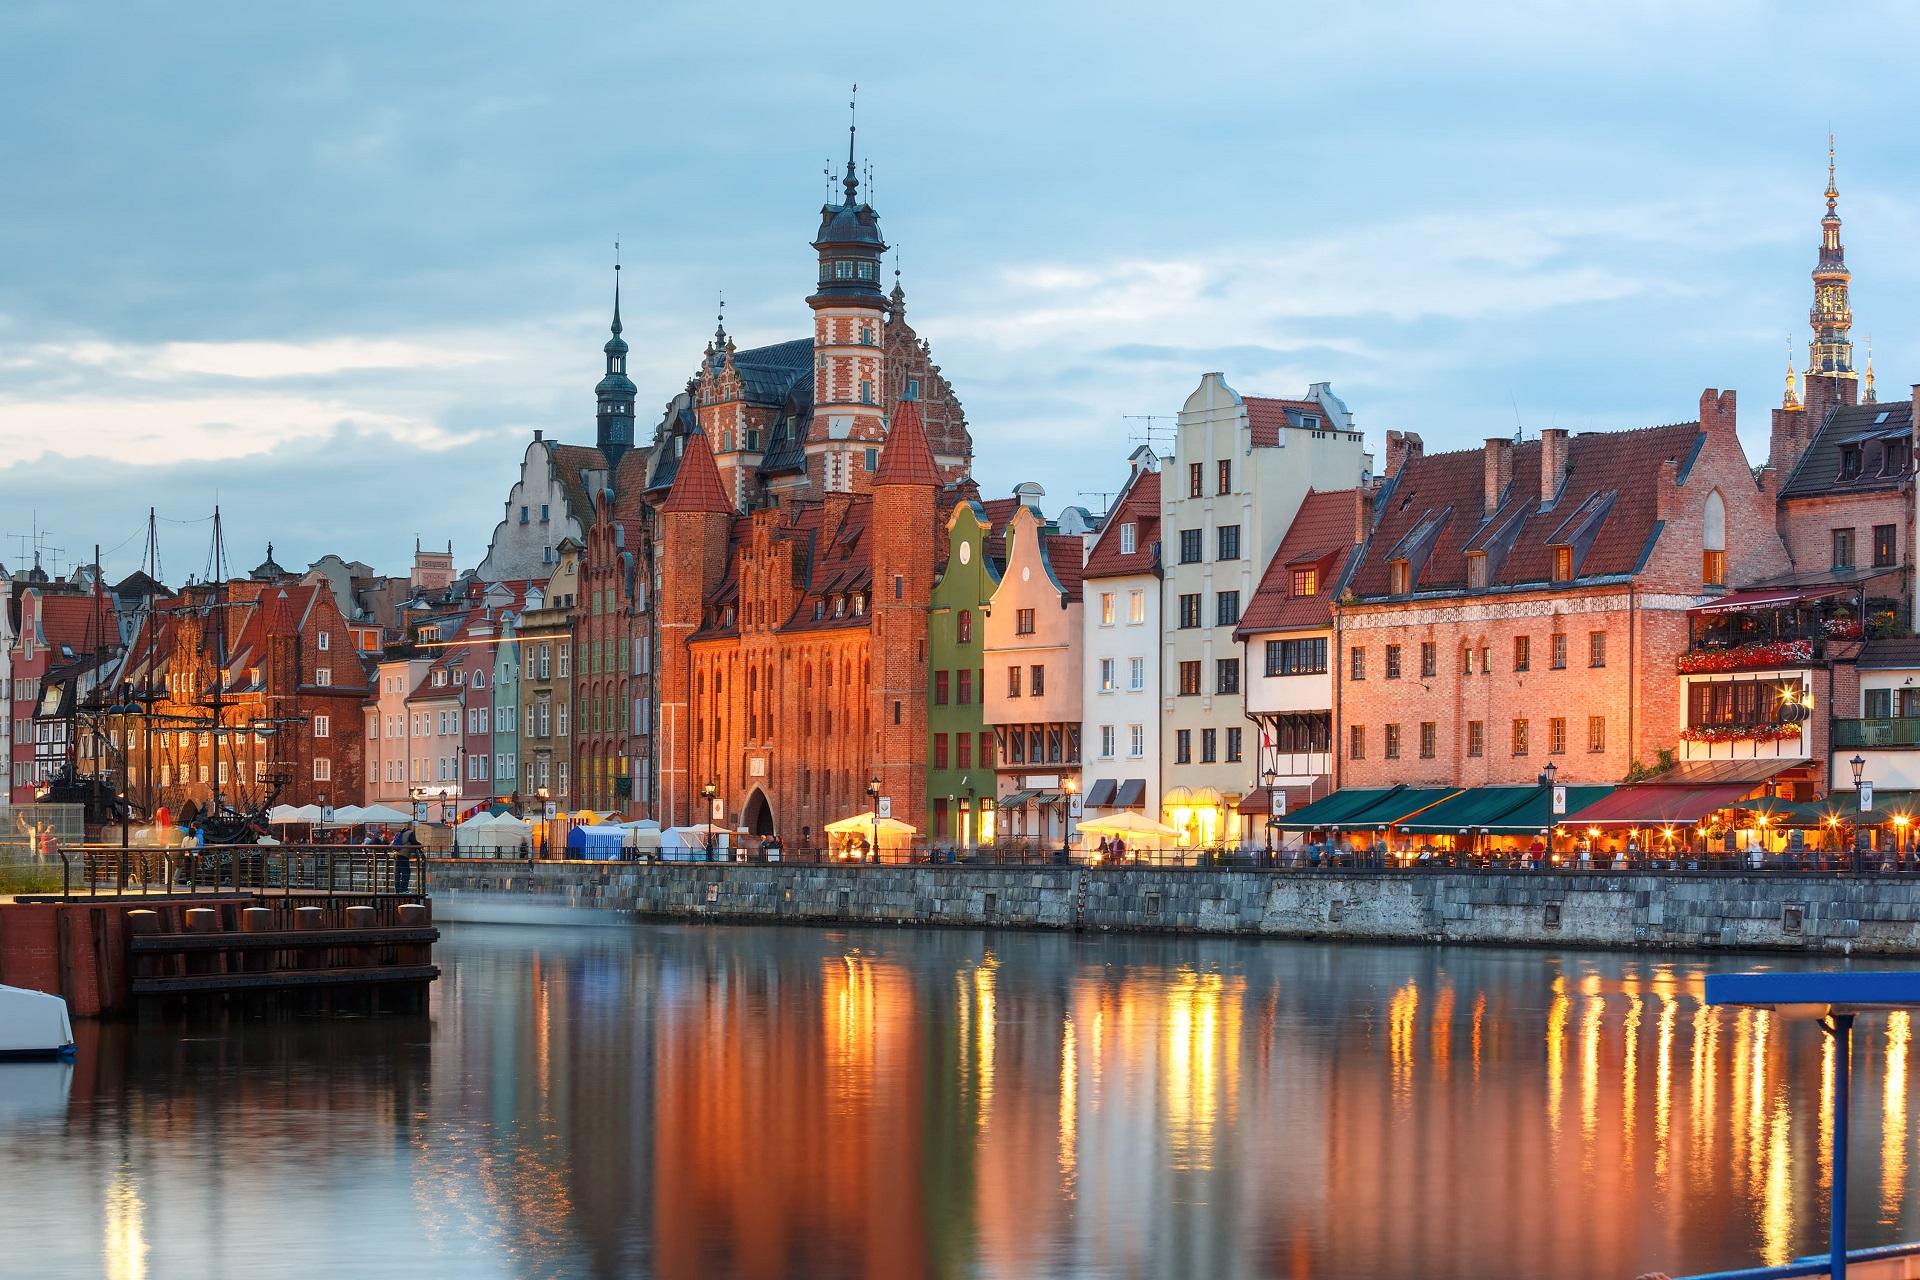 old-town-motlawa-river-gdansk-poland